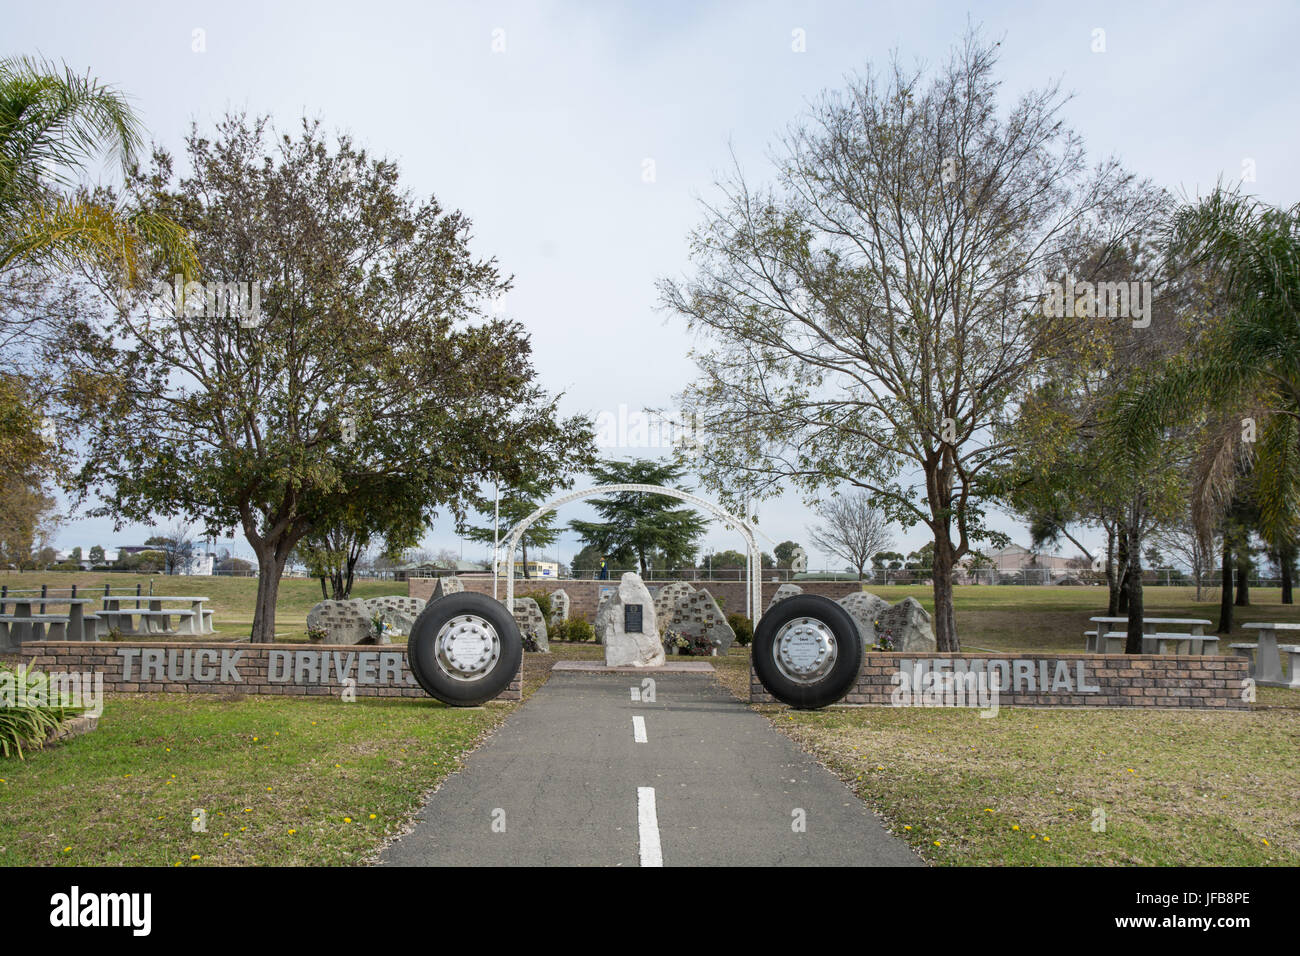 Truck Drivers Memorial Tamworth NSW Australia - Stock Image